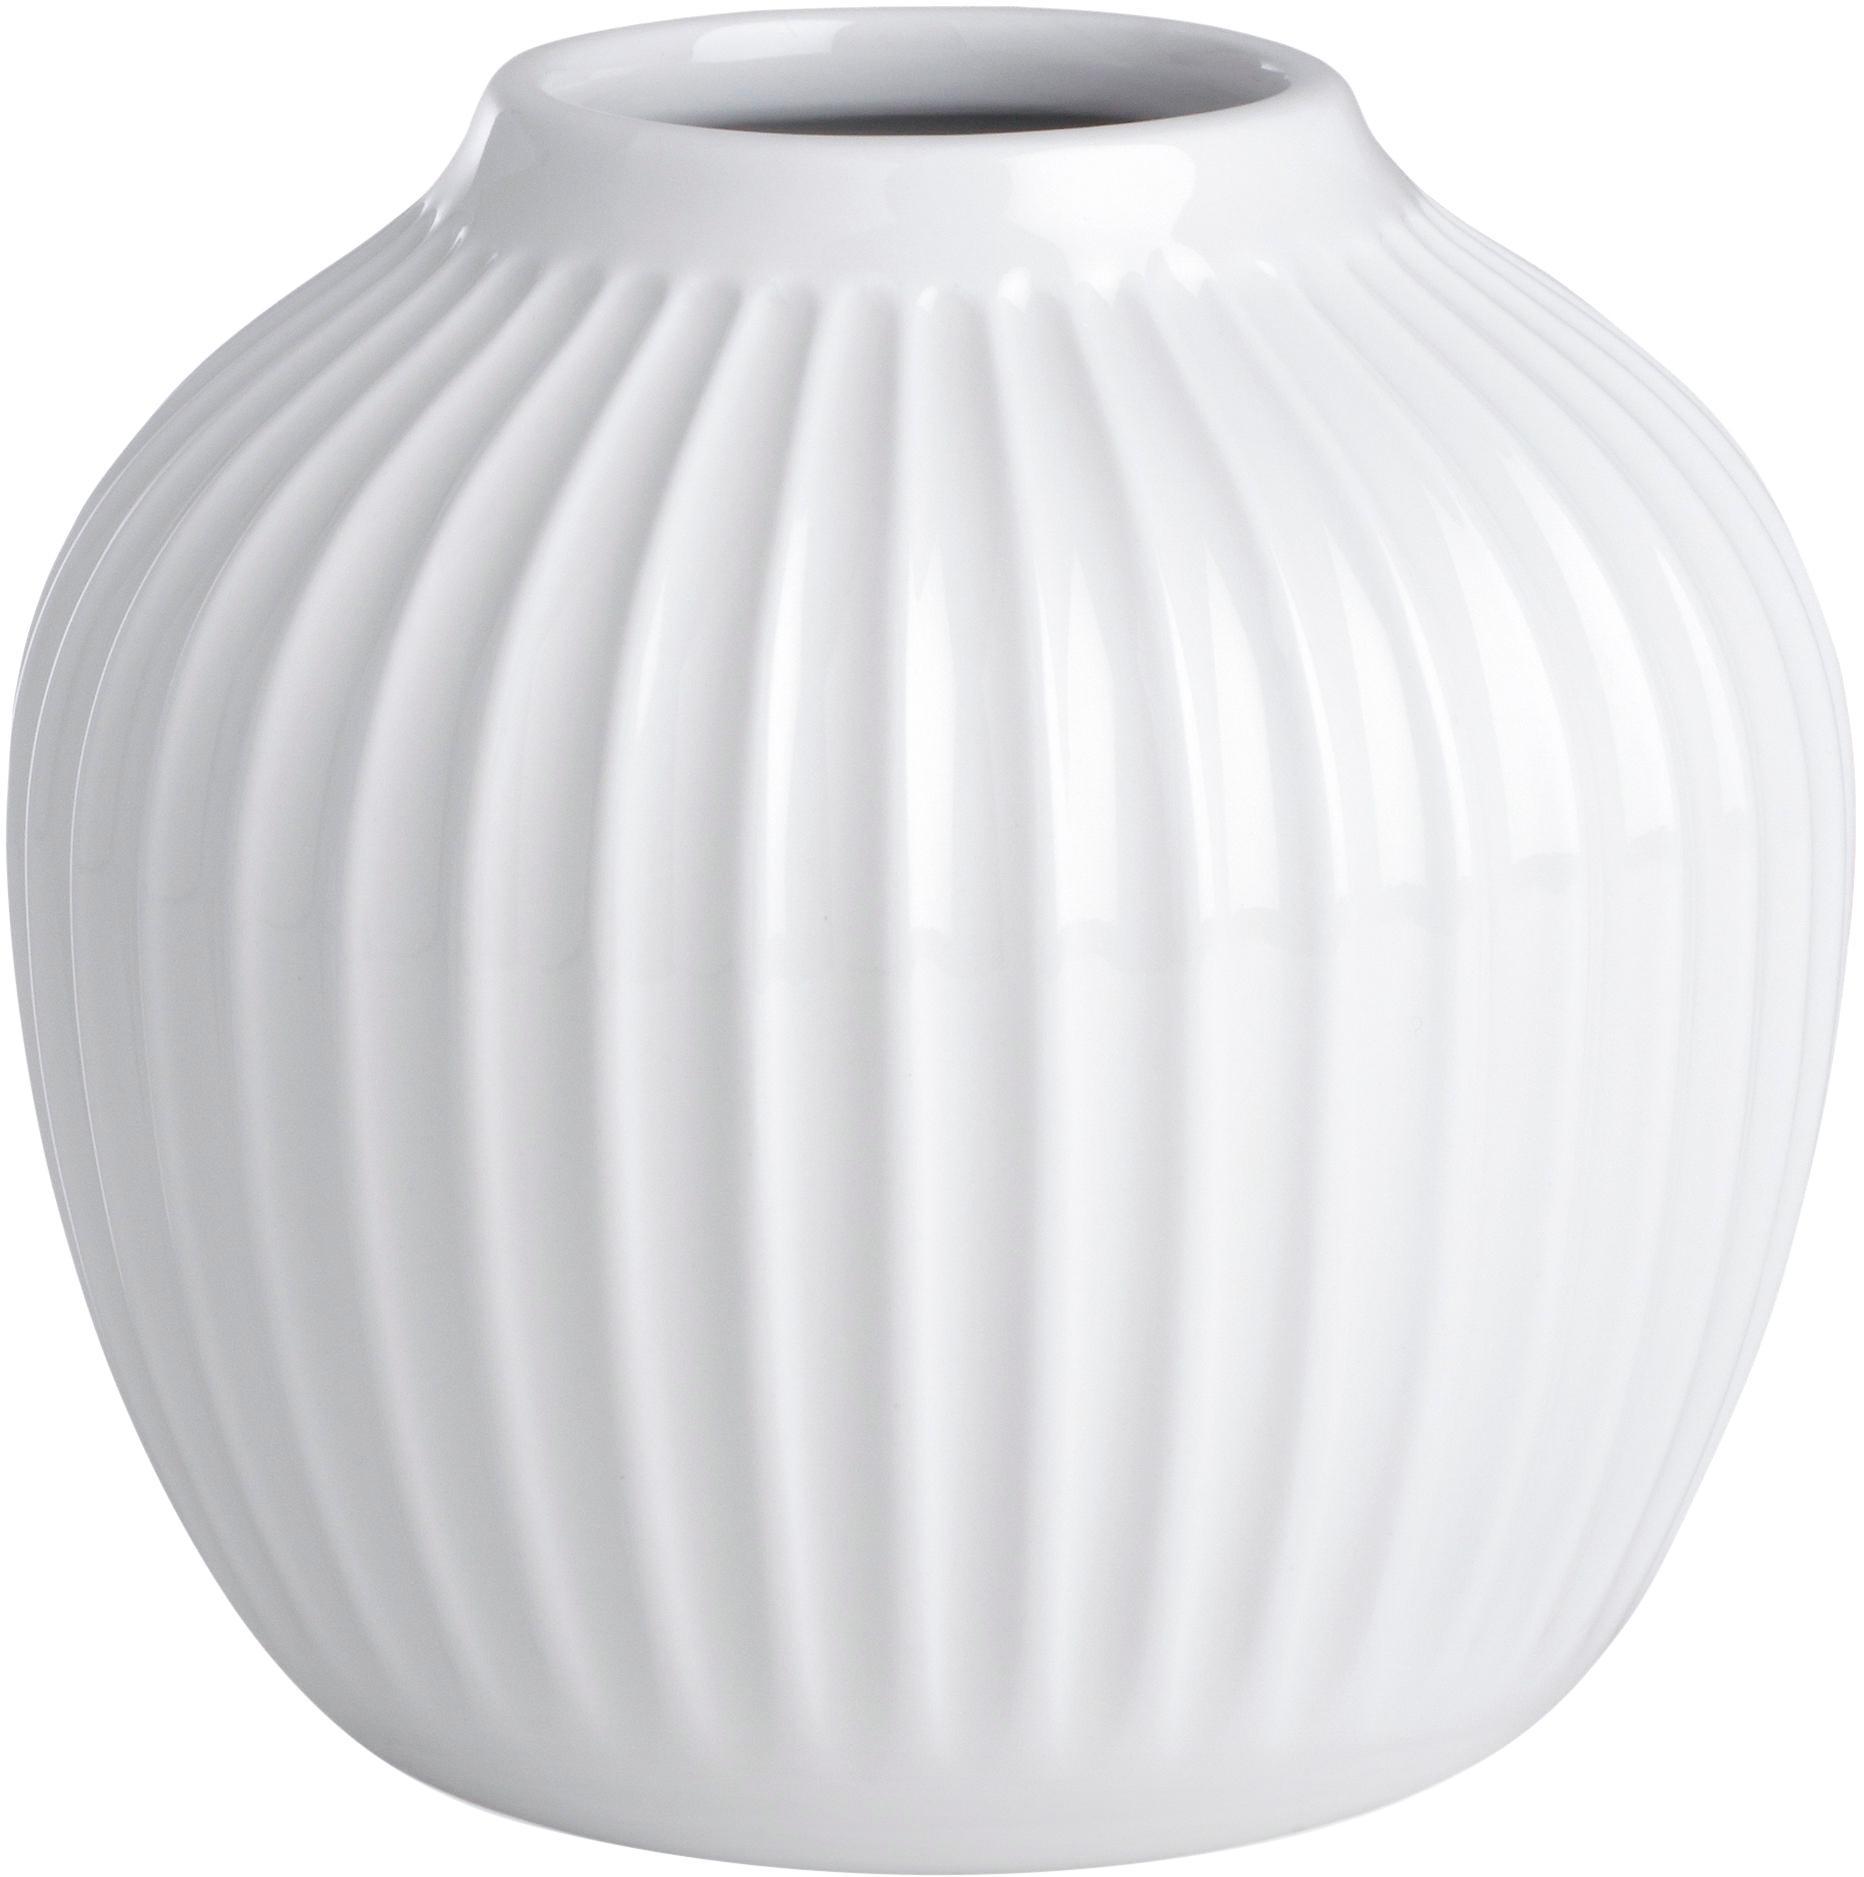 Vaso di design fatto a mano Hammershøi, Porcellana, Bianco, Ø 14 x Alt.13 cm